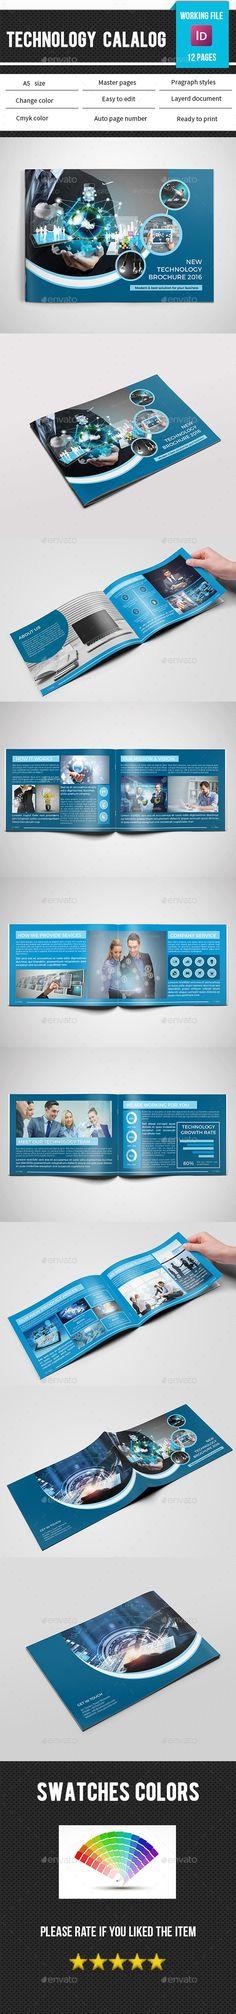 Technology Catalog/Brochure-V191 #technology #catalog #brochure